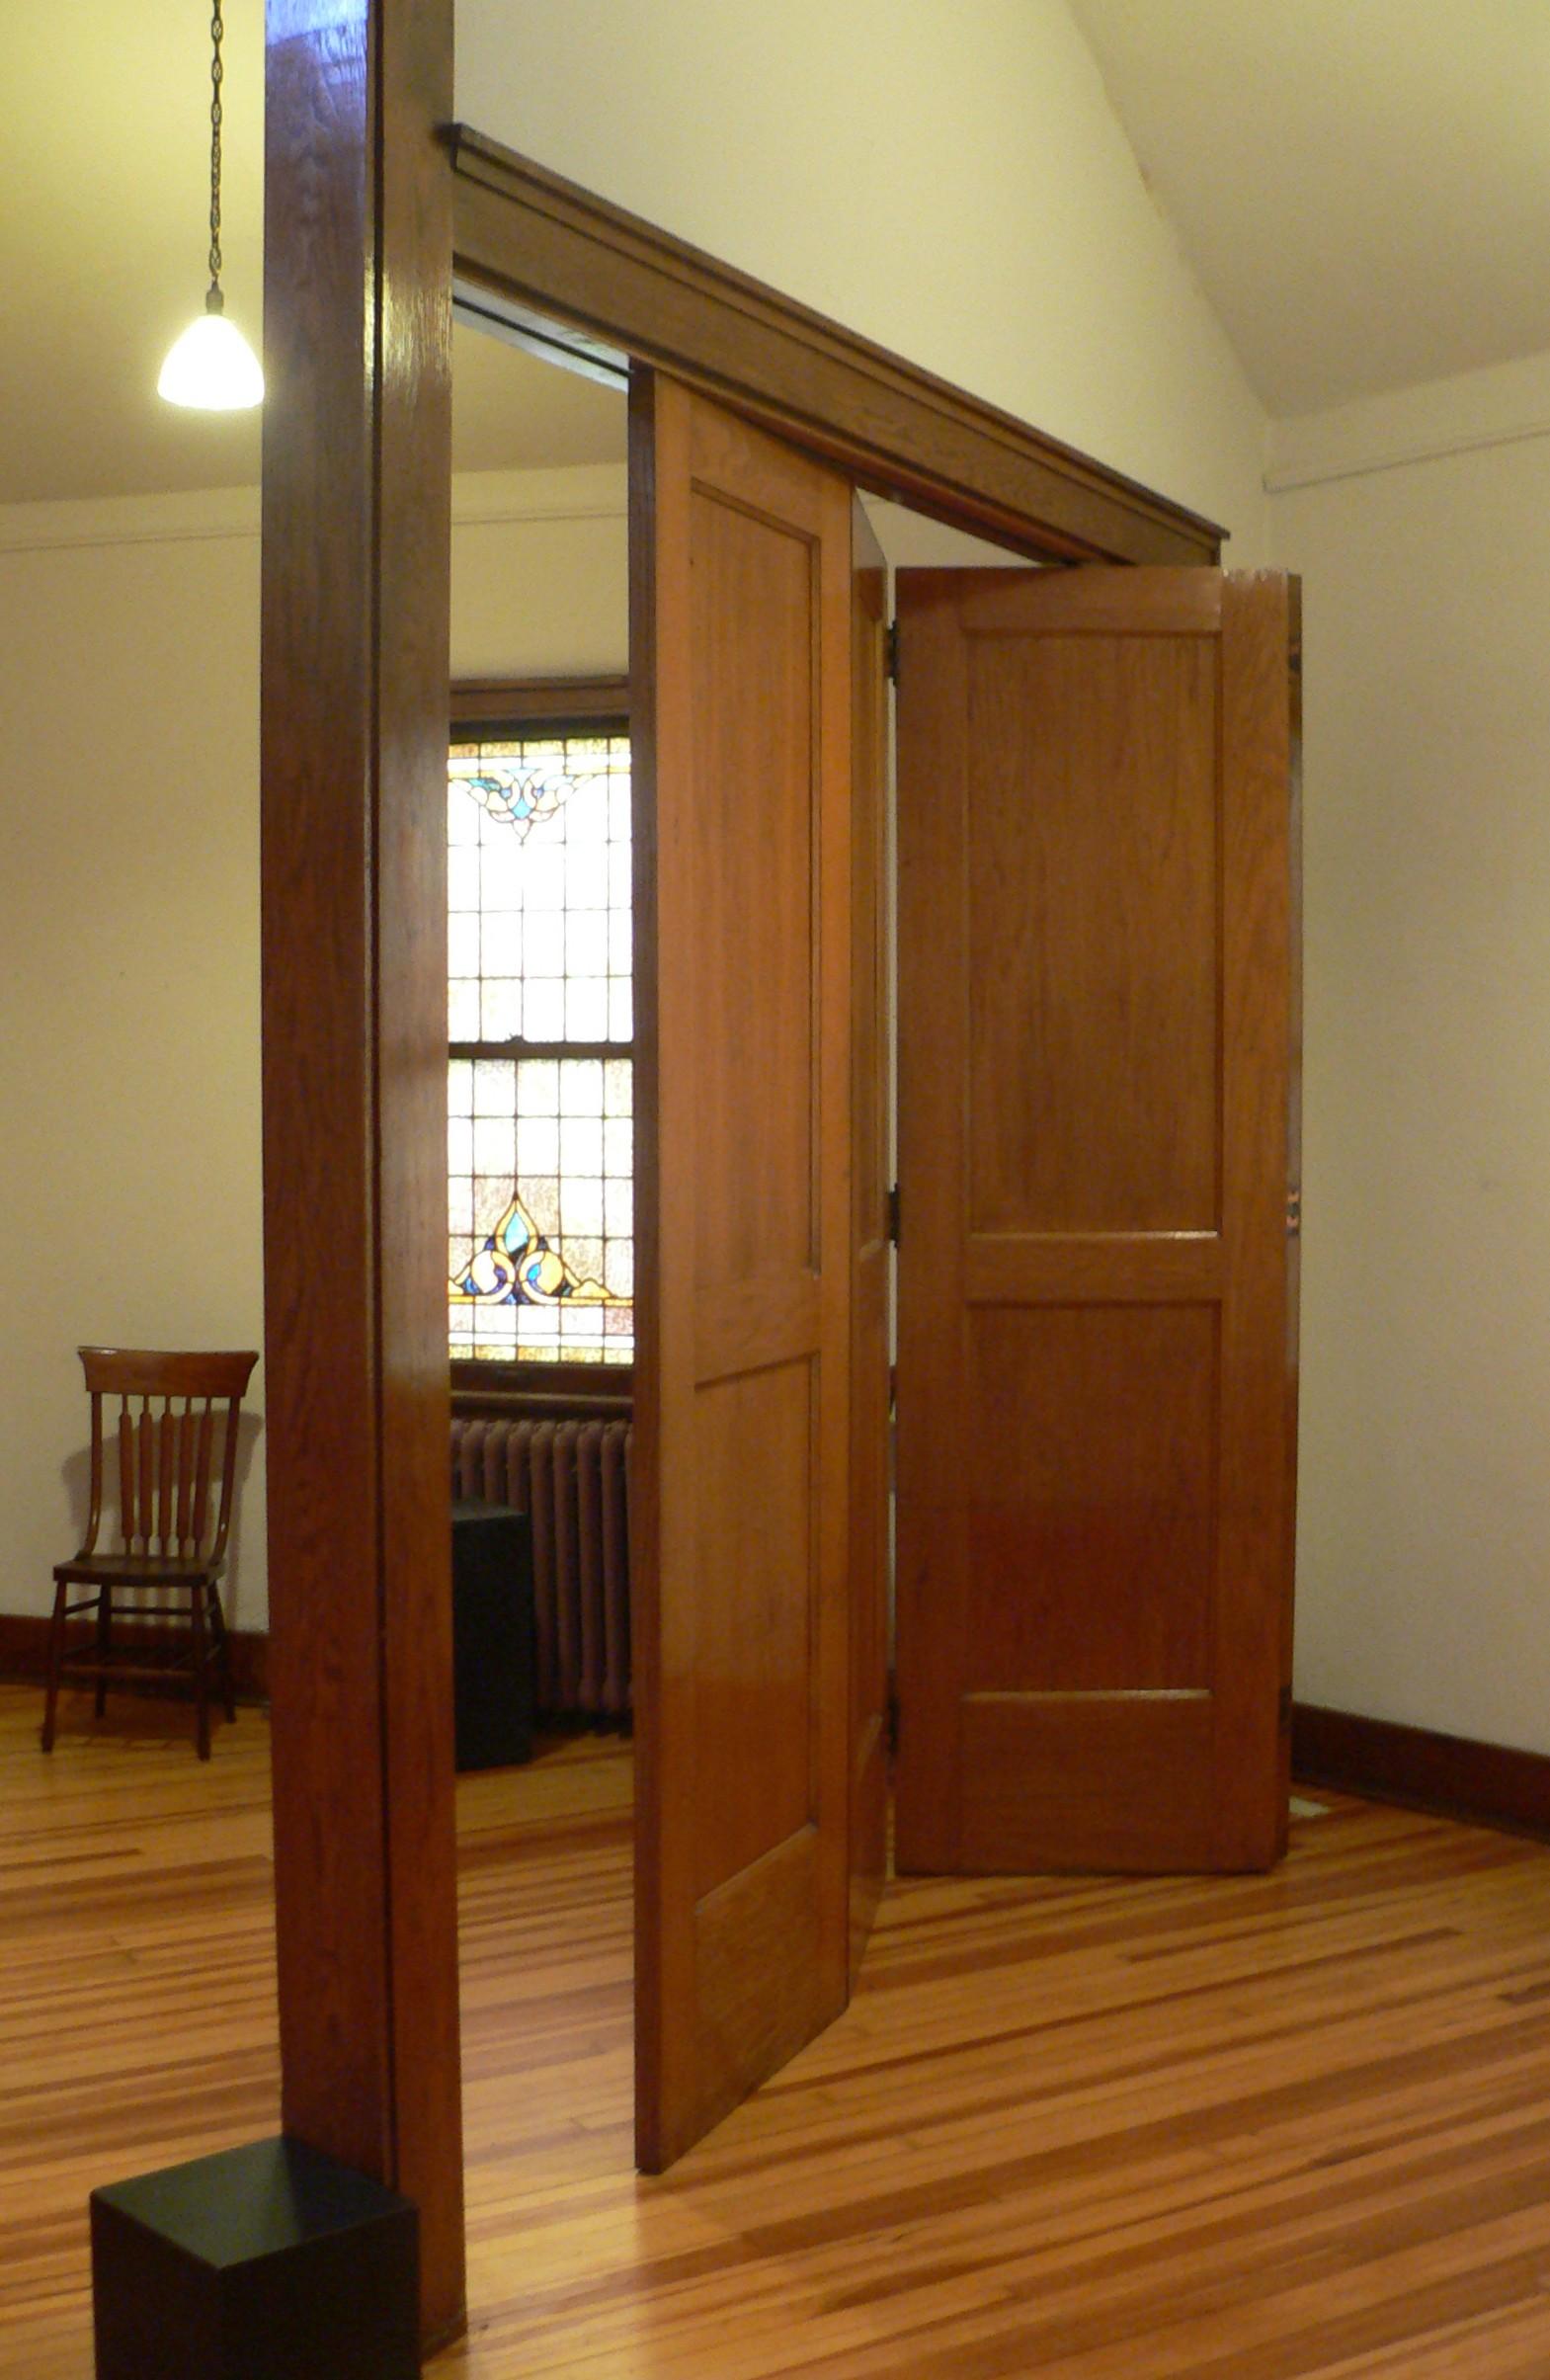 FileMadison Nebraska First Presbyterian Sunday-school doors 1.JPG & File:Madison Nebraska First Presbyterian Sunday-school doors 1.JPG ...